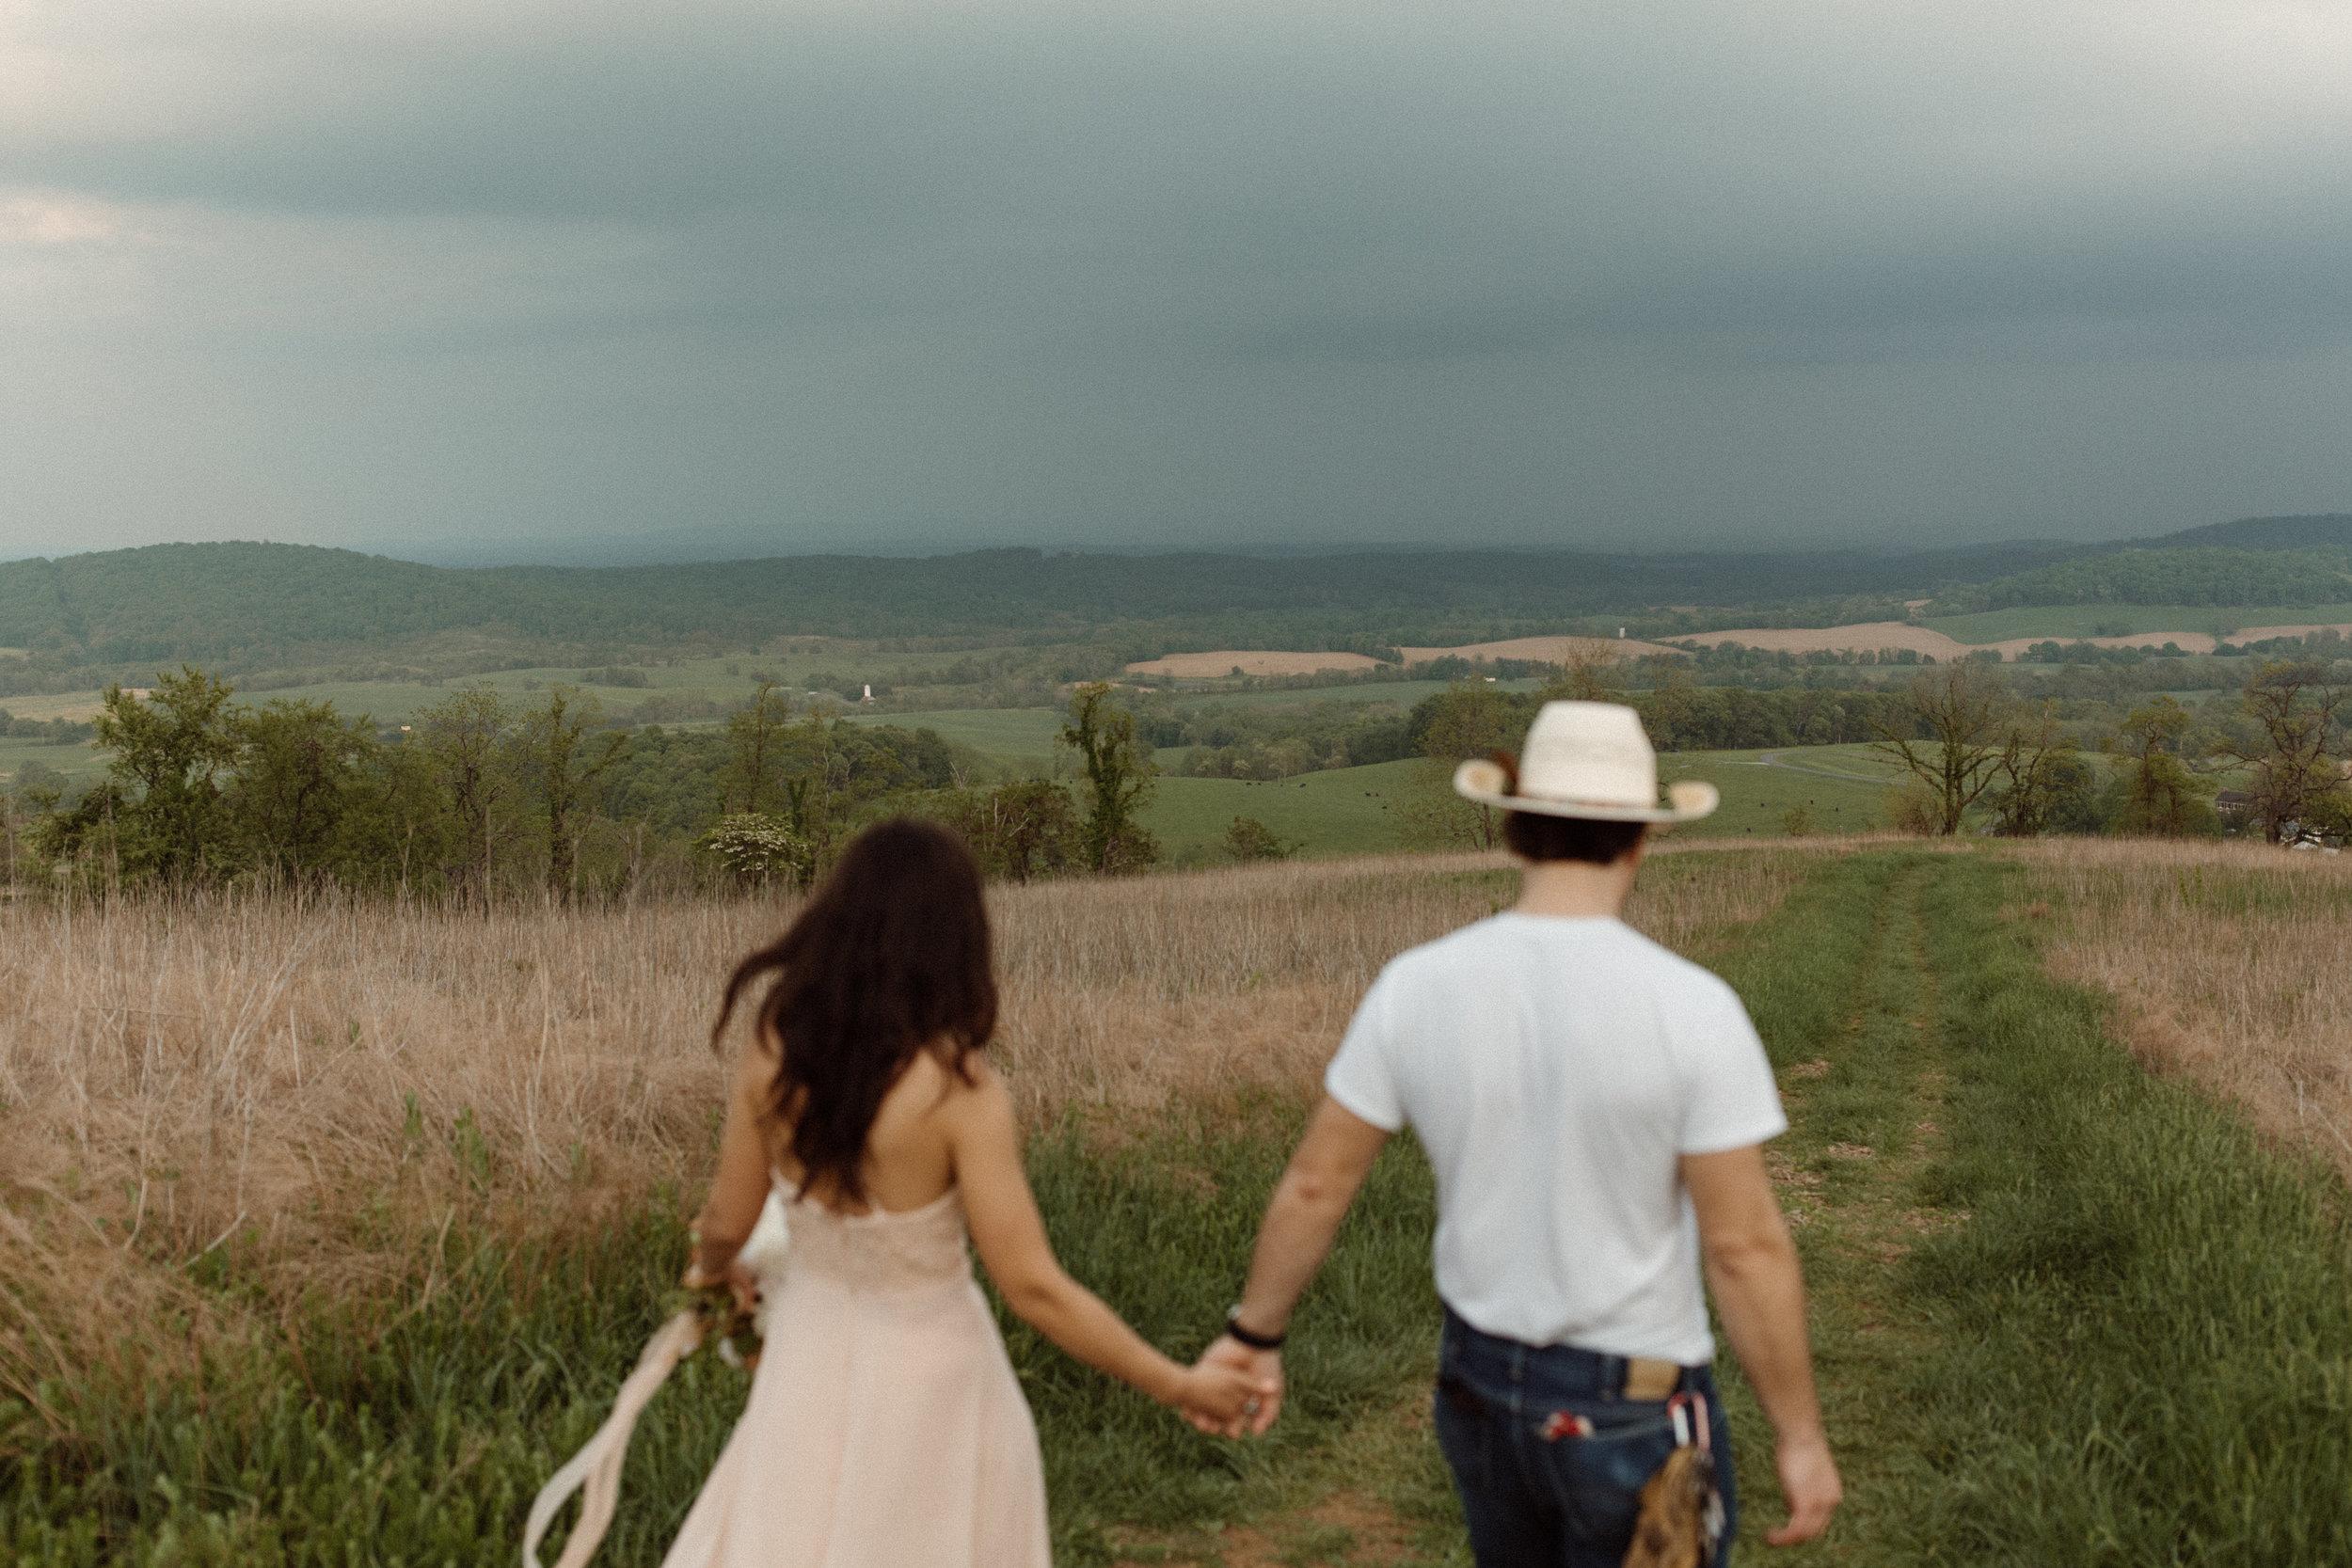 kelsey&mark-engagement-skymeadows-2019-peytoncurry-0087.jpg